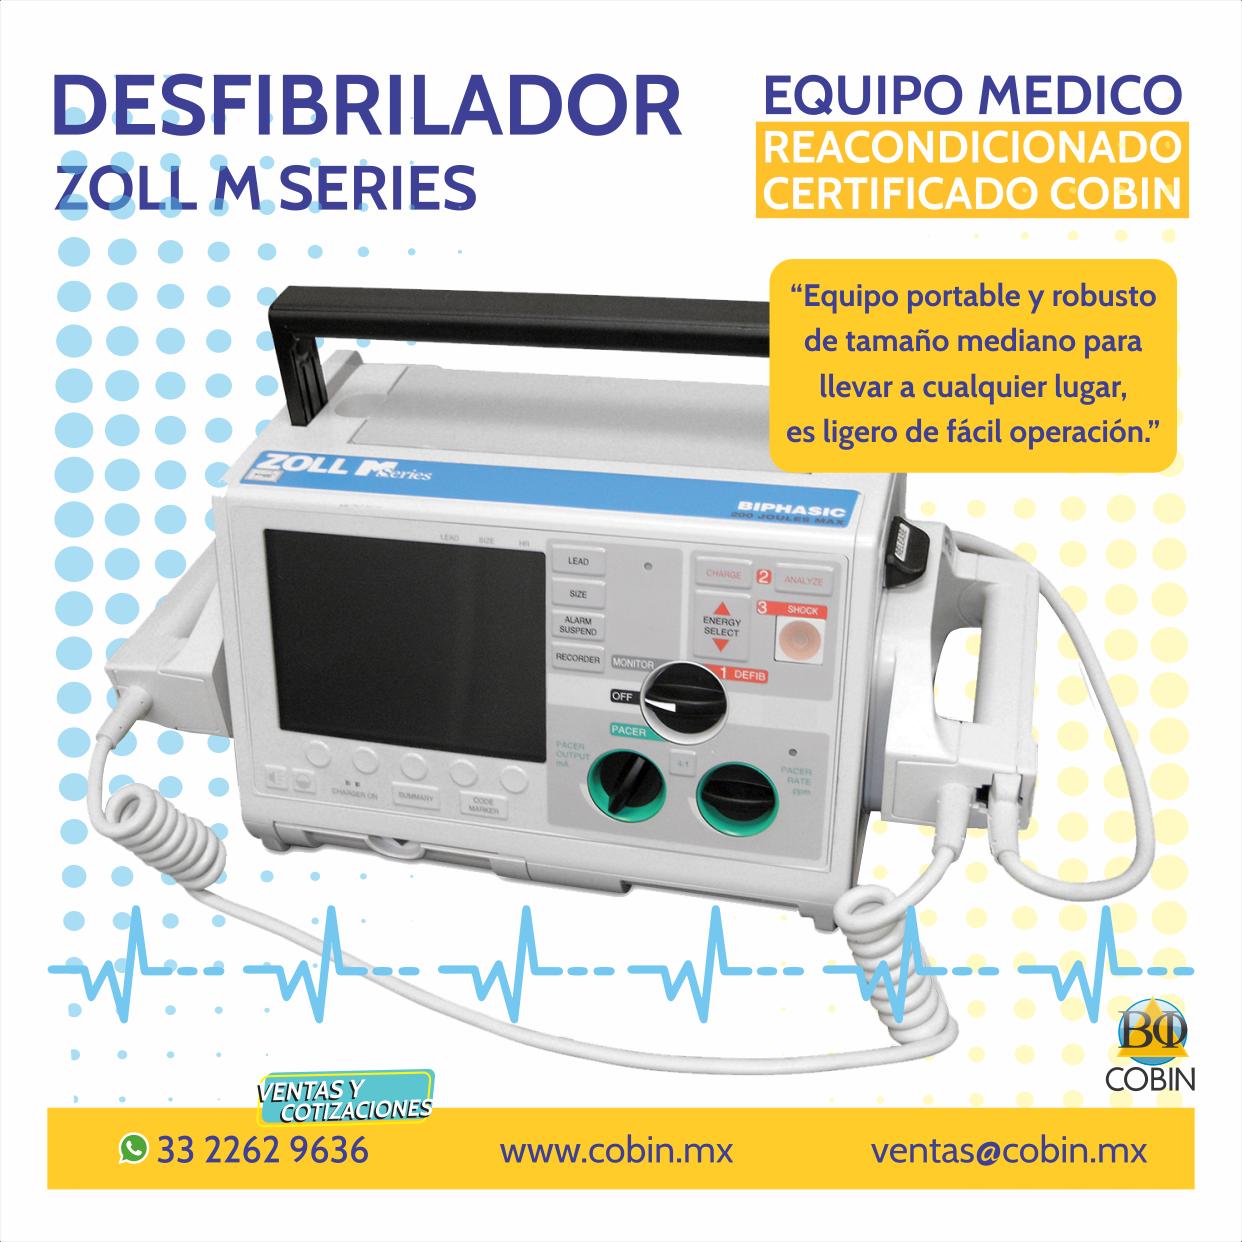 Desfibrilador Zoll  M Series